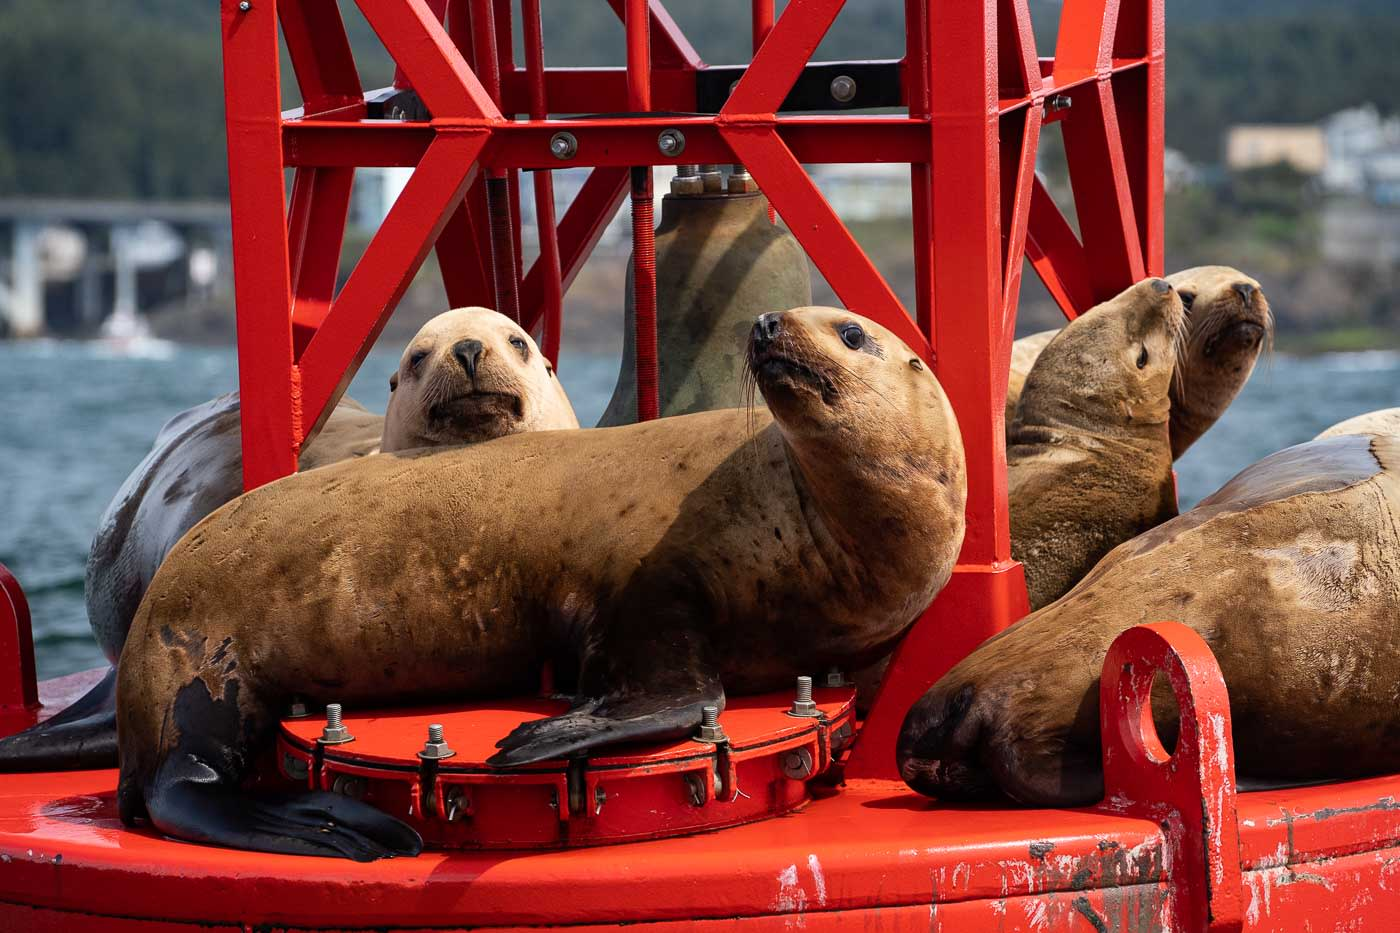 Sea pups with the new camera setup